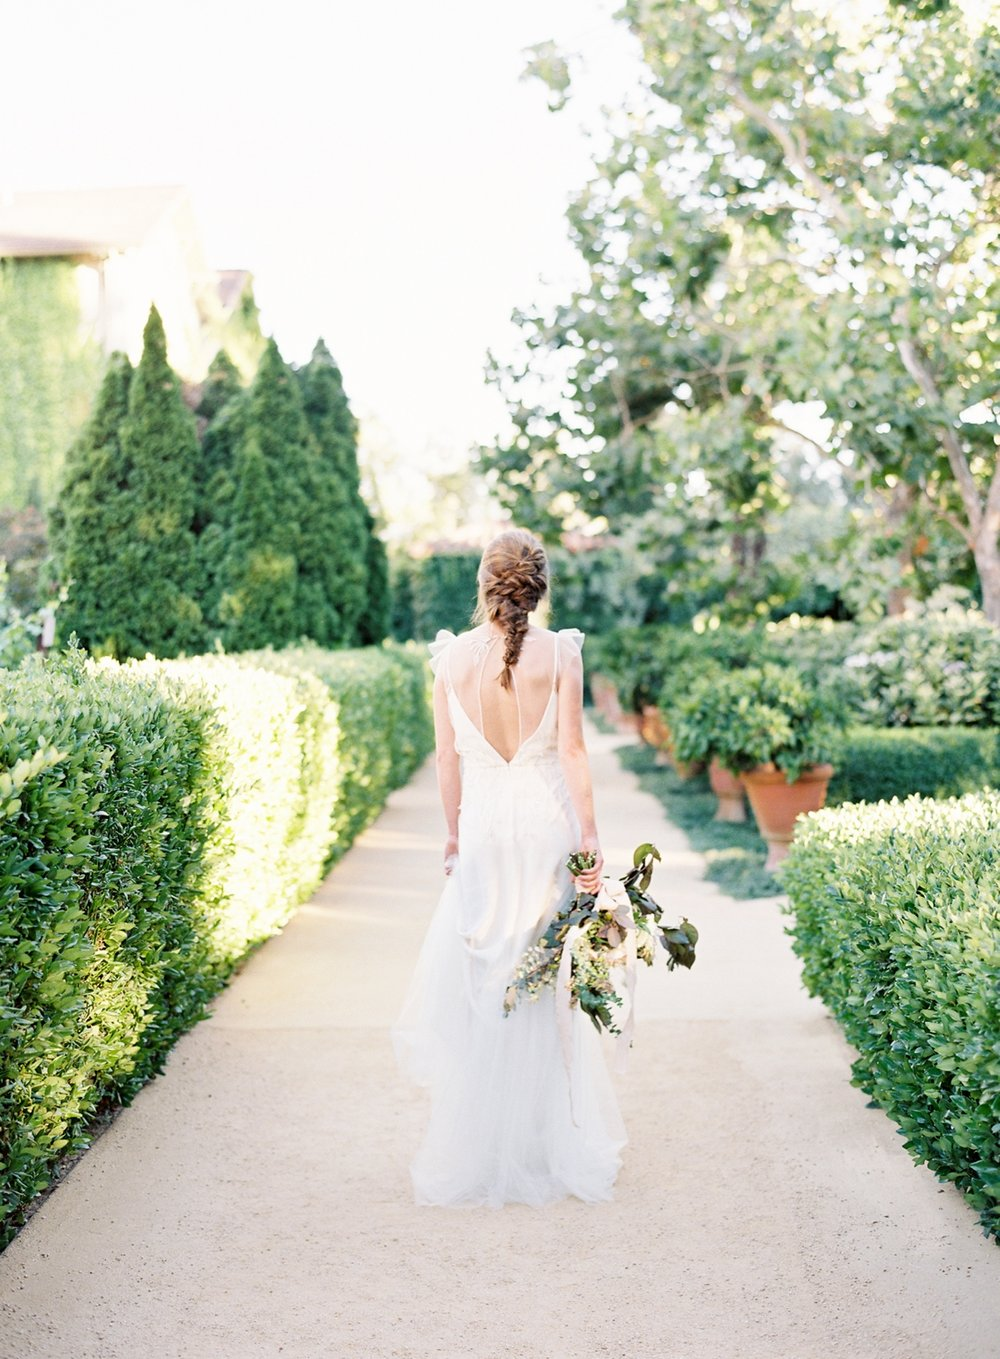 Esmeralda+Franco+Photography+-+Fine+Art+Film+Wedding+Photography+-+San+Francisco+-+Napa+-+Sonoma+-+Big+Sur+-+Carmel+-+Italy+-+Santorini+-+Paris+-+South+Of+France+-+Destination+wedding_0610.jpg